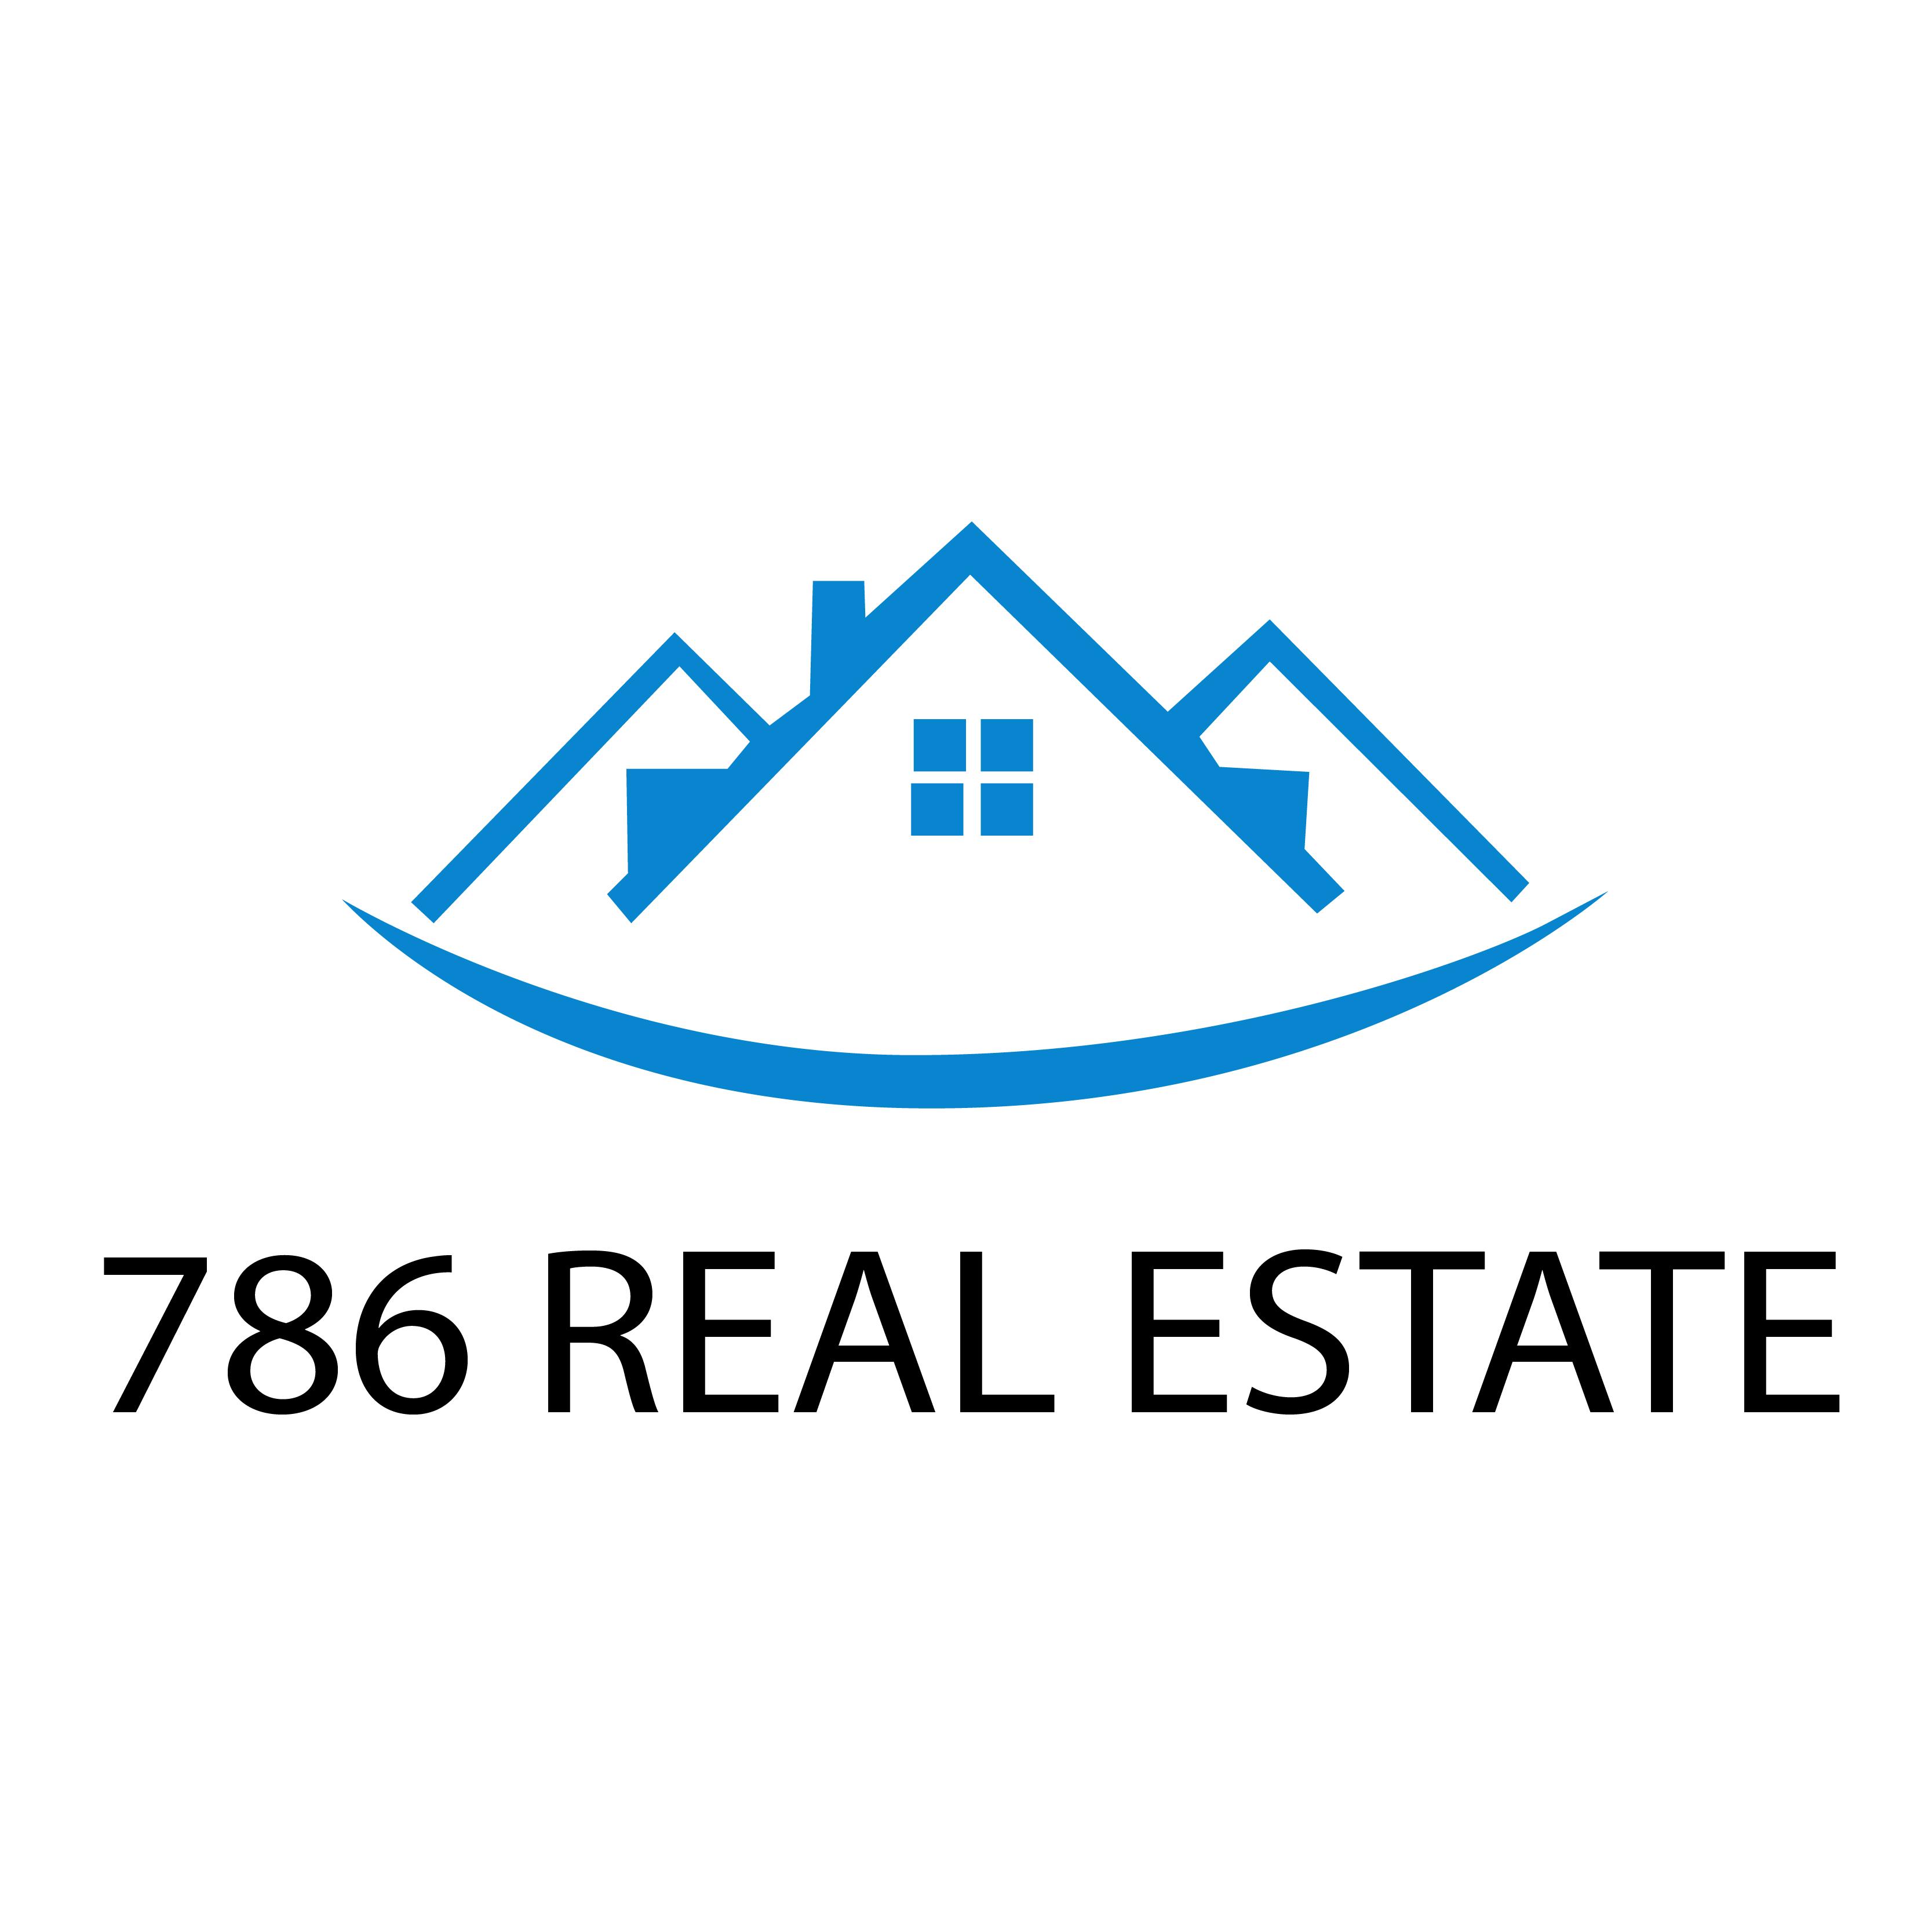 786 Real Estate (Karachi)